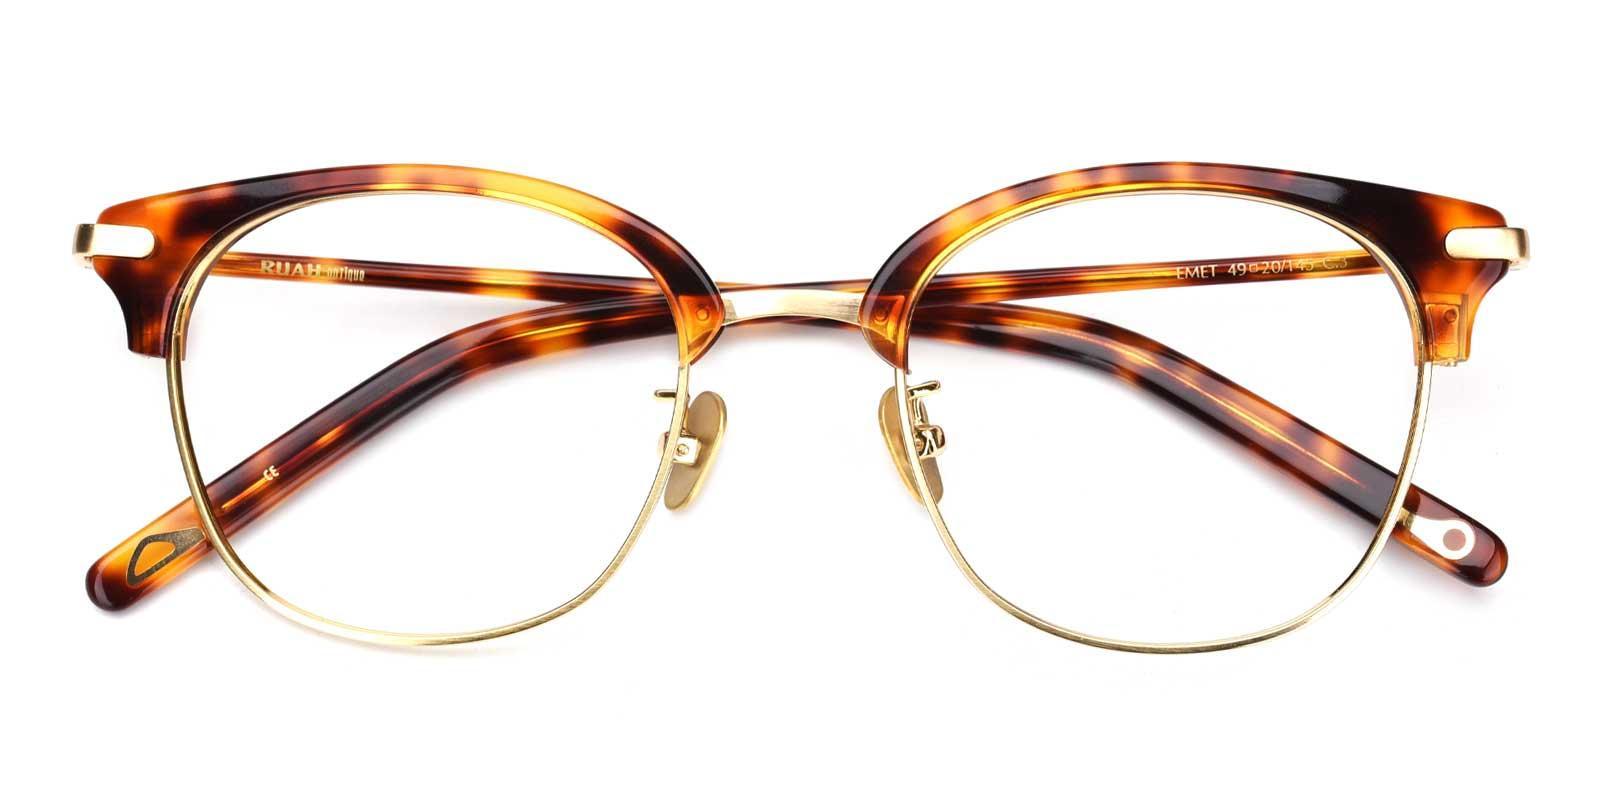 Baron-Tortoise-Browline-Titanium-Eyeglasses-detail